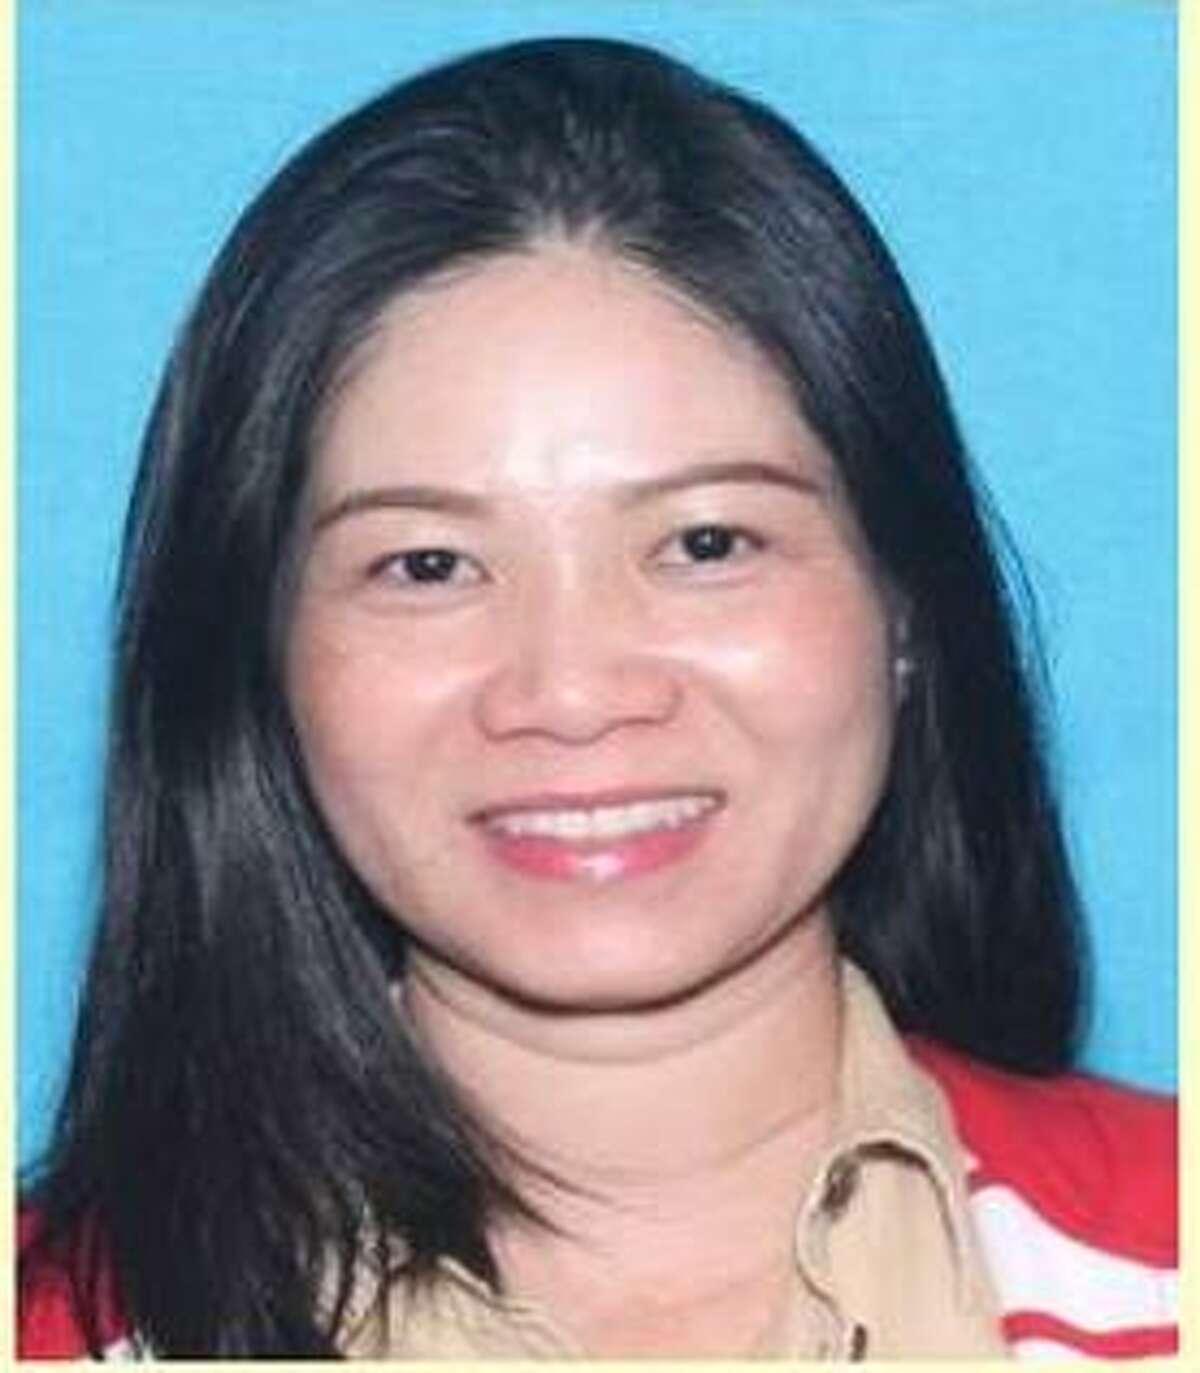 Lieu Nguyen, shooting victim